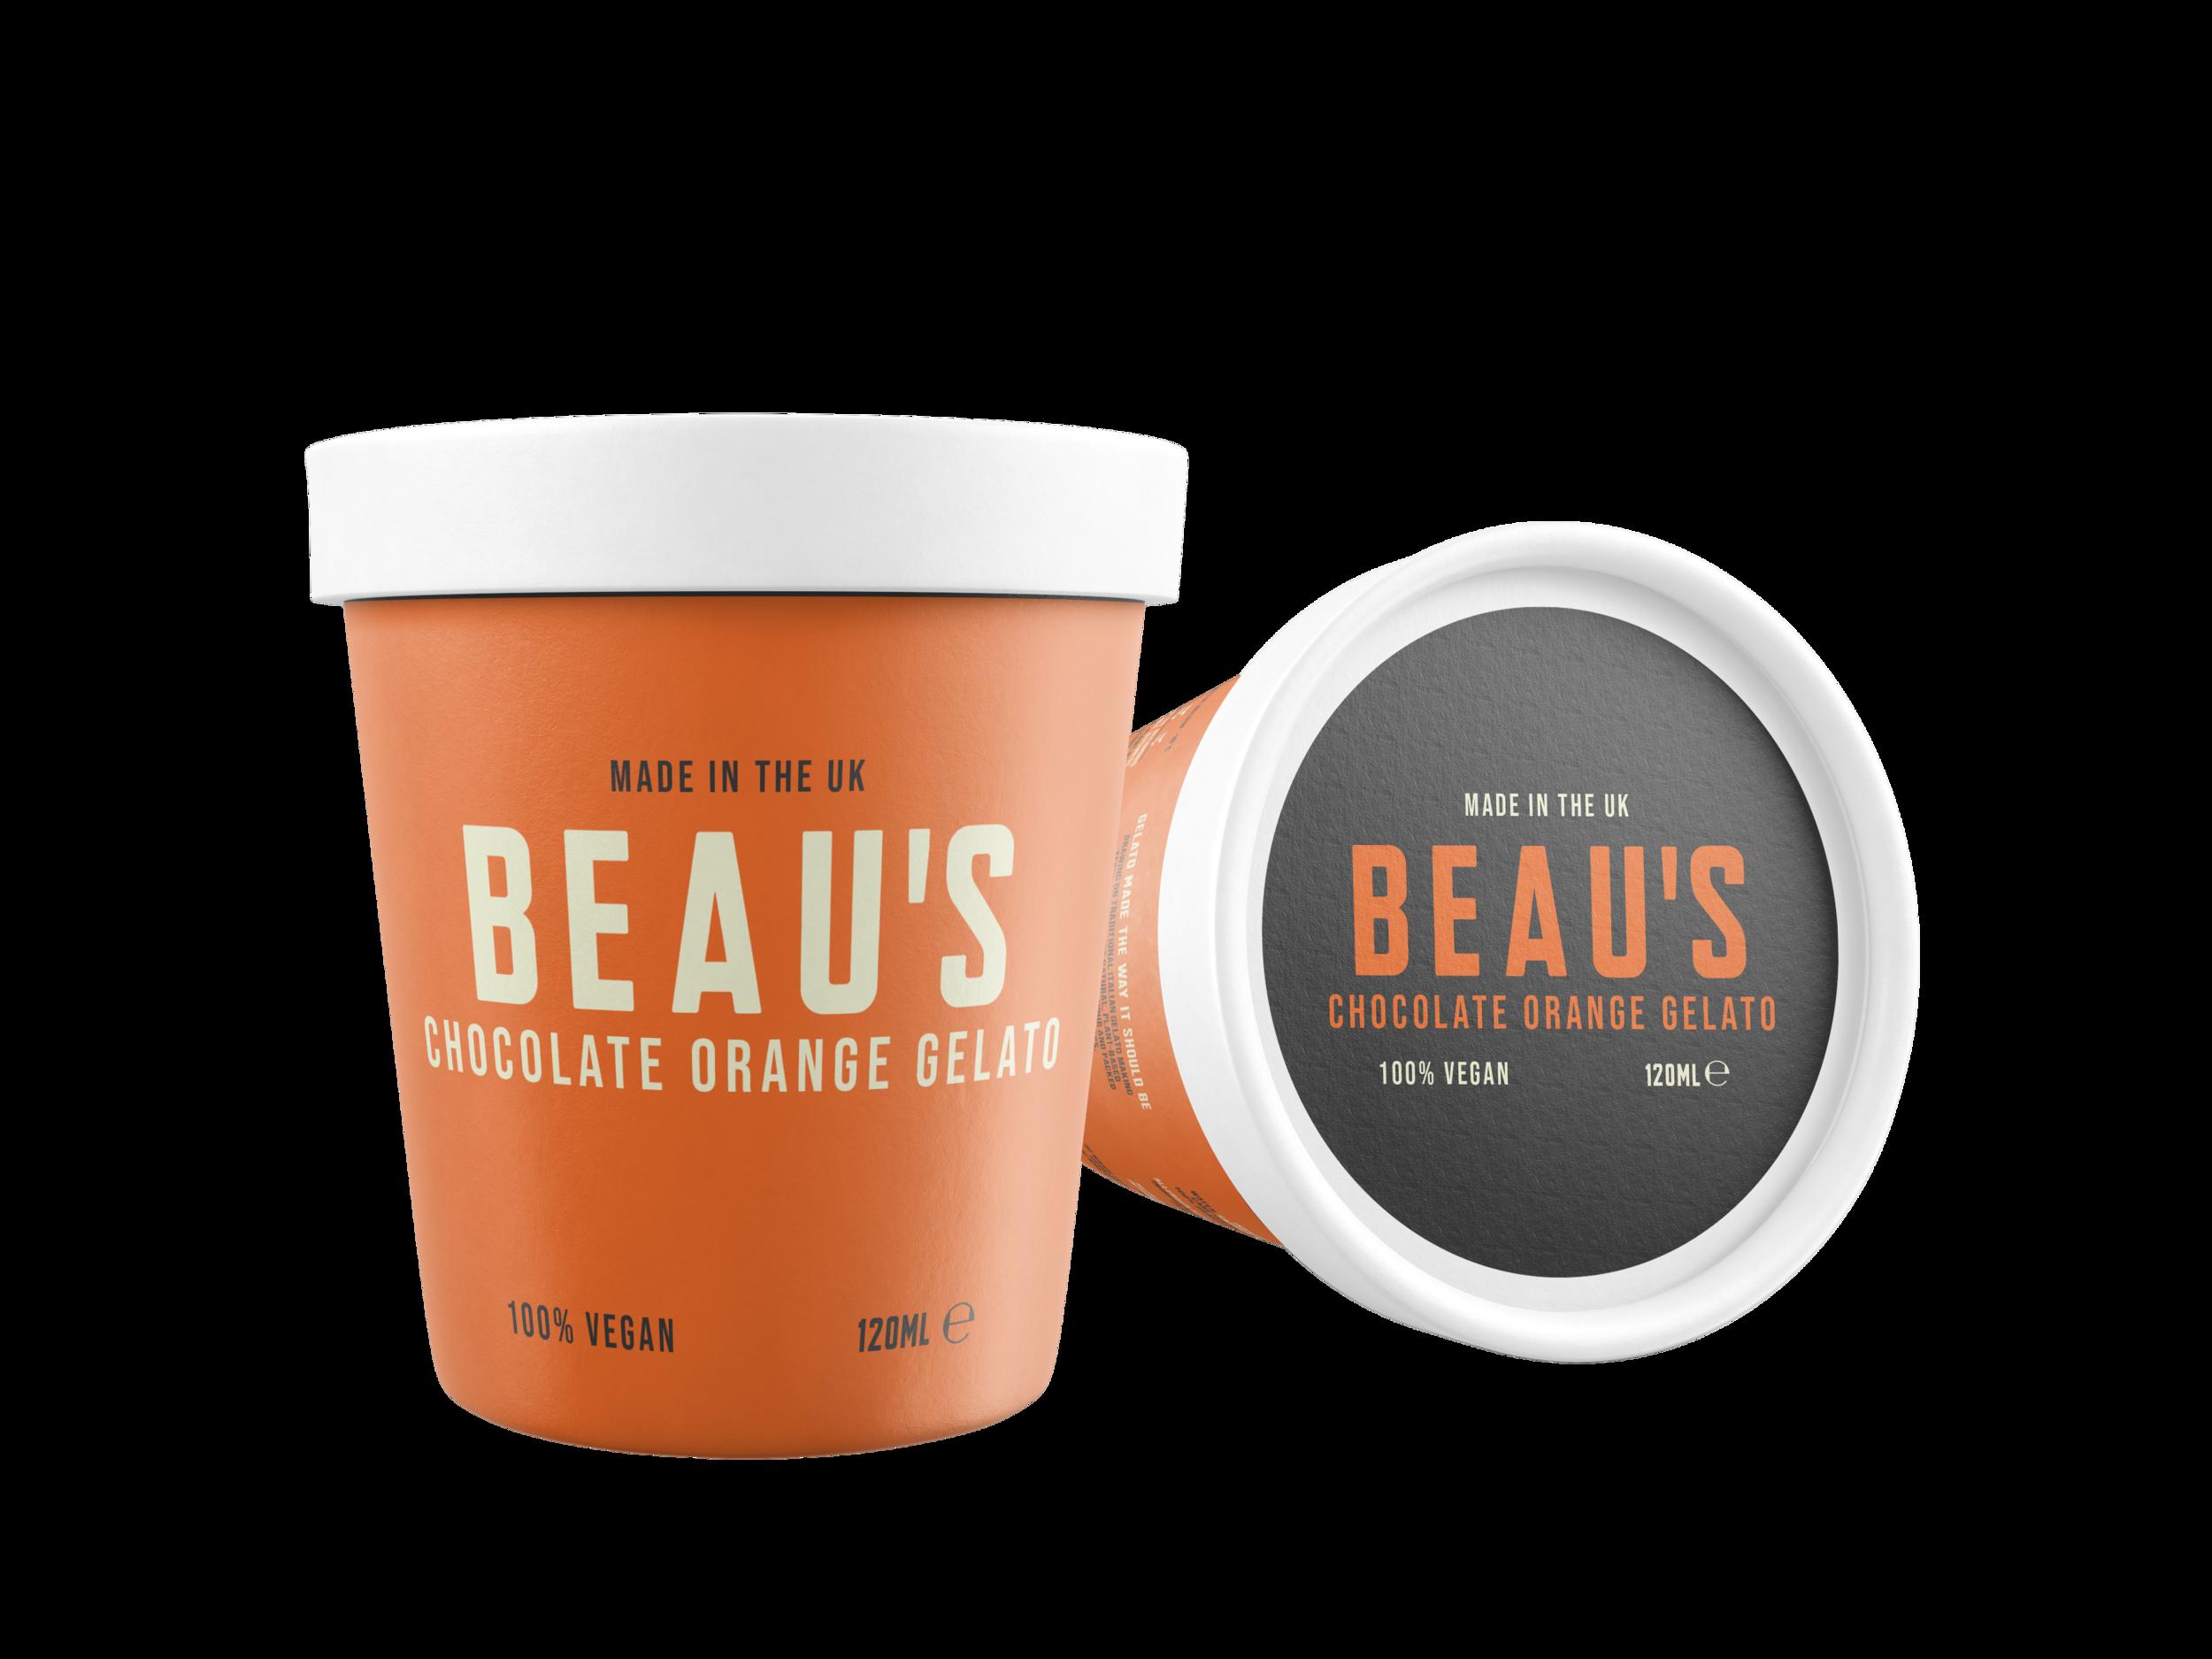 Beau's Chocolate Orange 120ml tub design